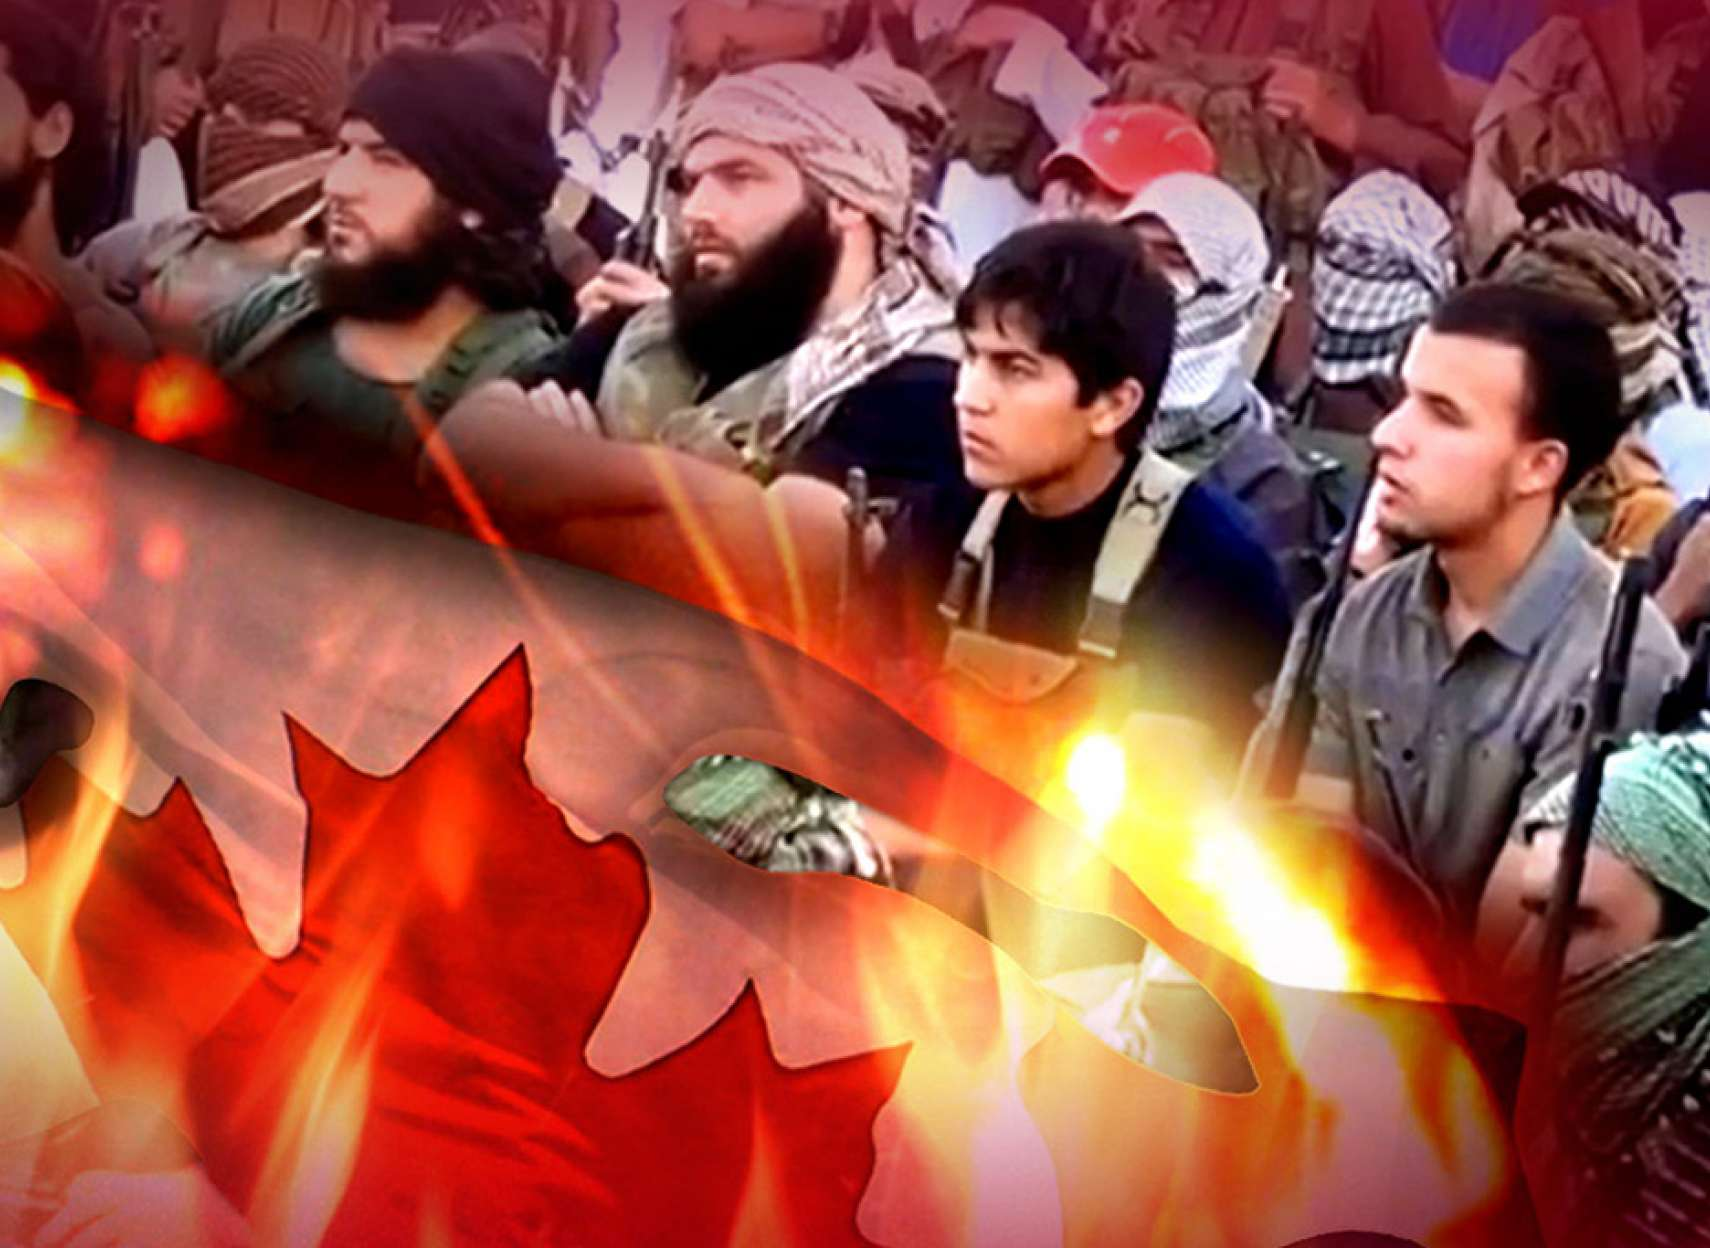 اخبار-کانادا-گردش-آزادانه-داعشیها-در-کانادا